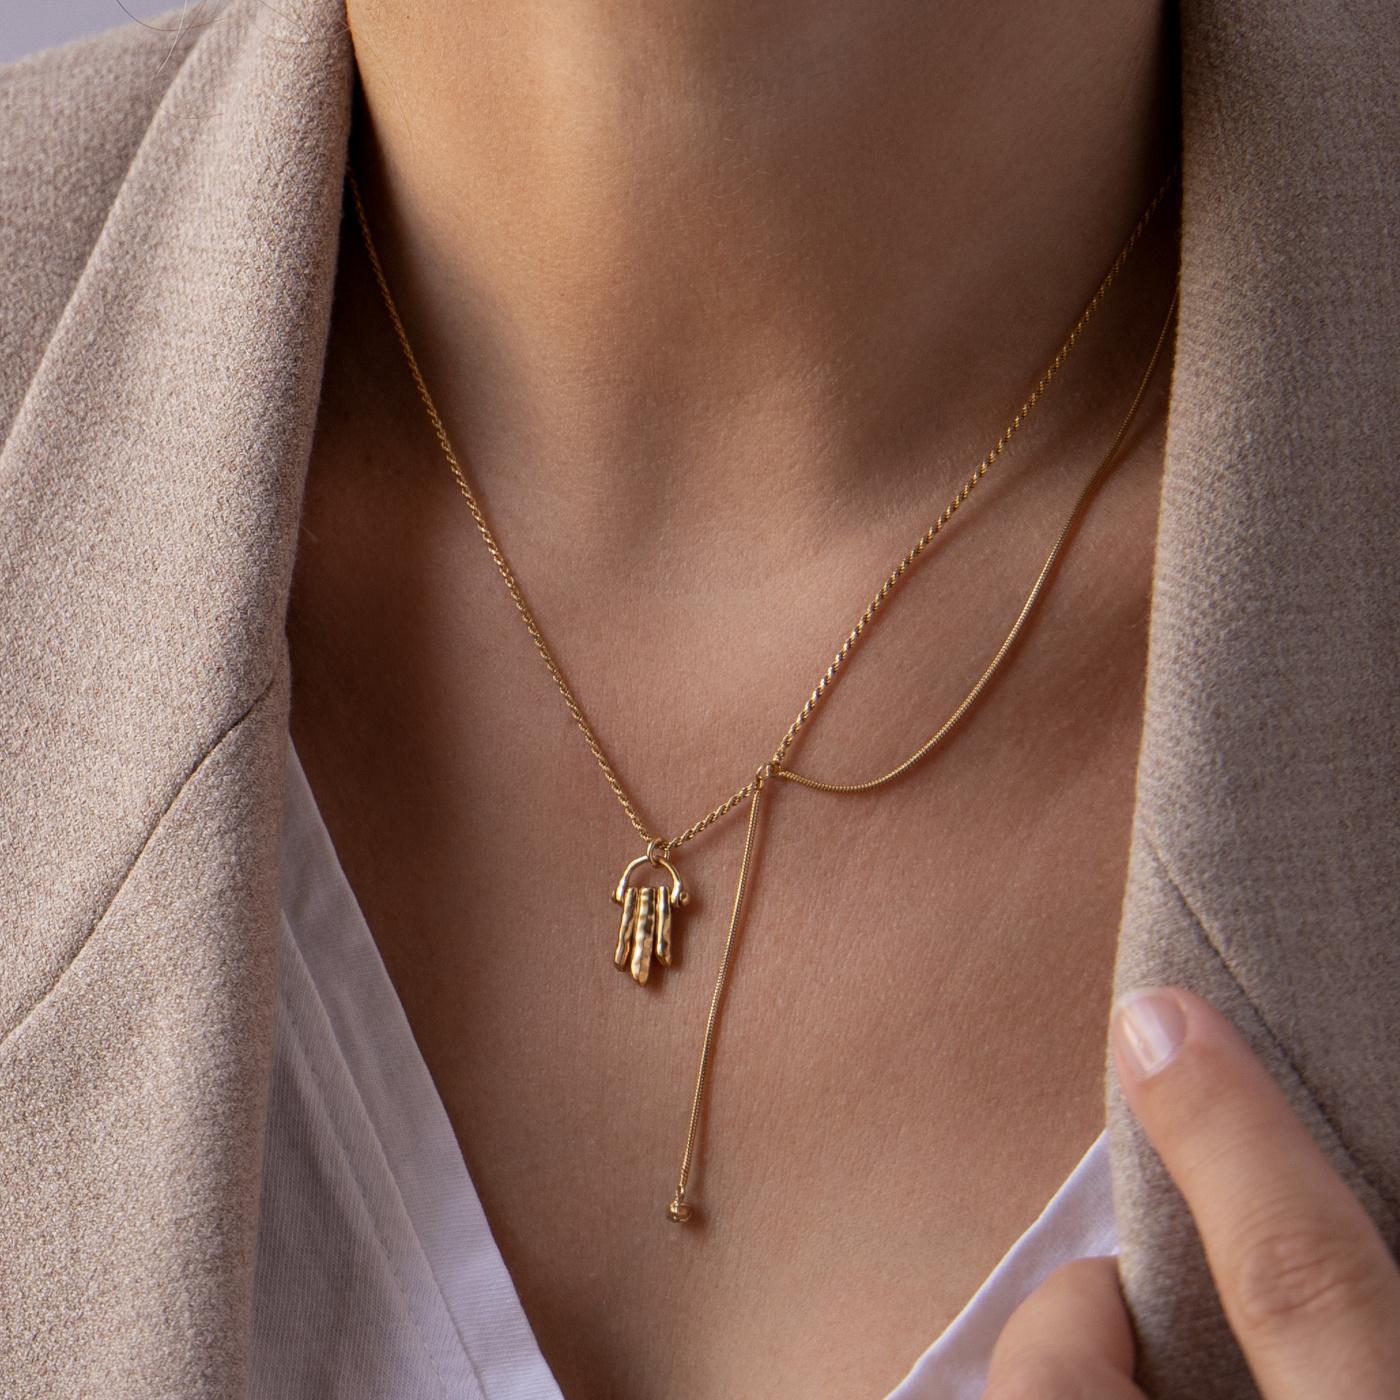 Violet Hamden Sisterhood Moonsister collana color oro in argento sterling 925